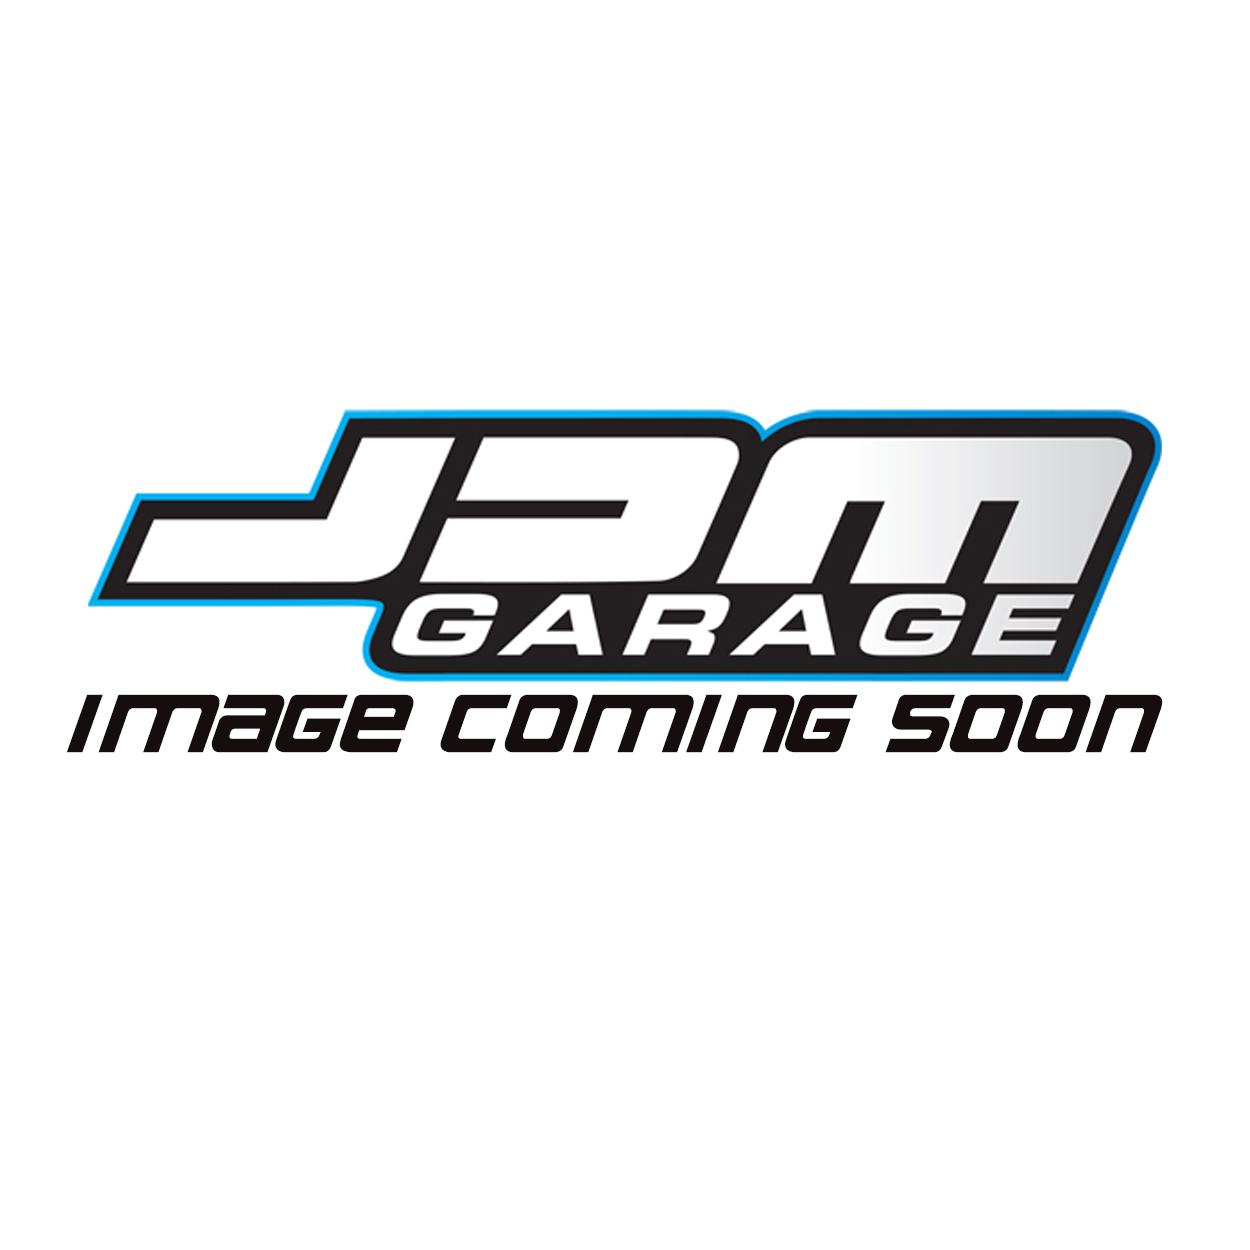 JDMGarageUK Waving Cat Sticker